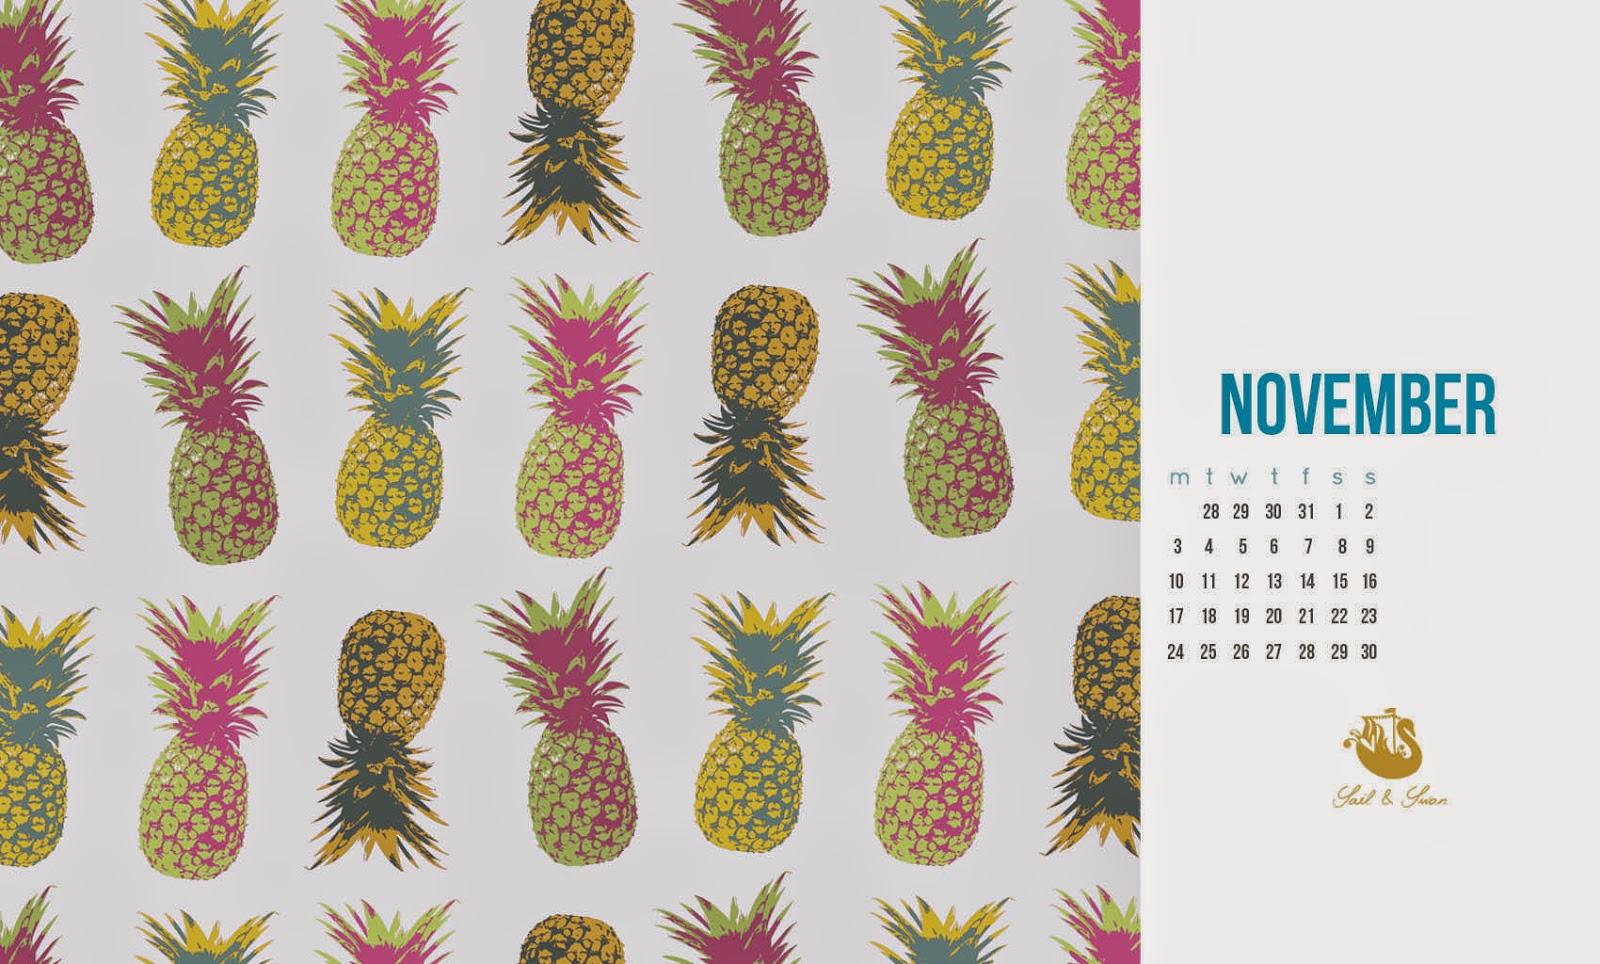 free desktop background pineapple pattern sail and swan